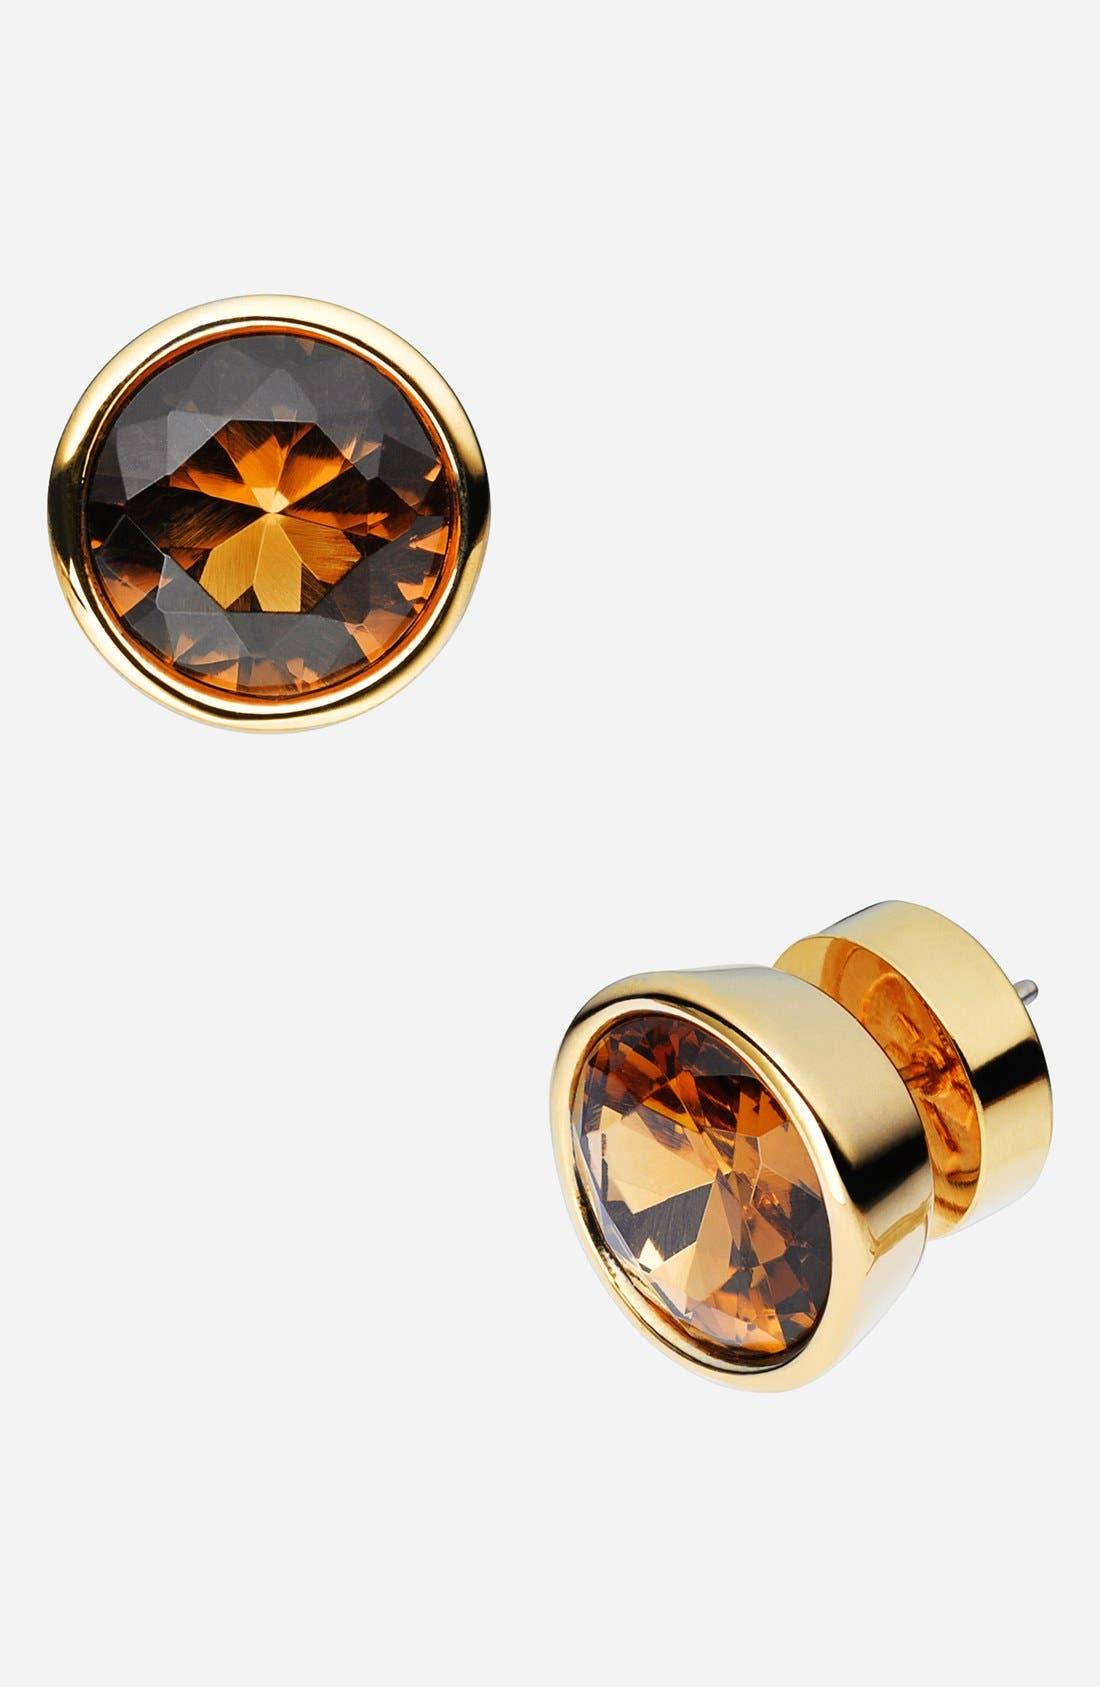 Main Image - Michael Kors 'Glam Classics' Cubic Zirconia Stud Earrings